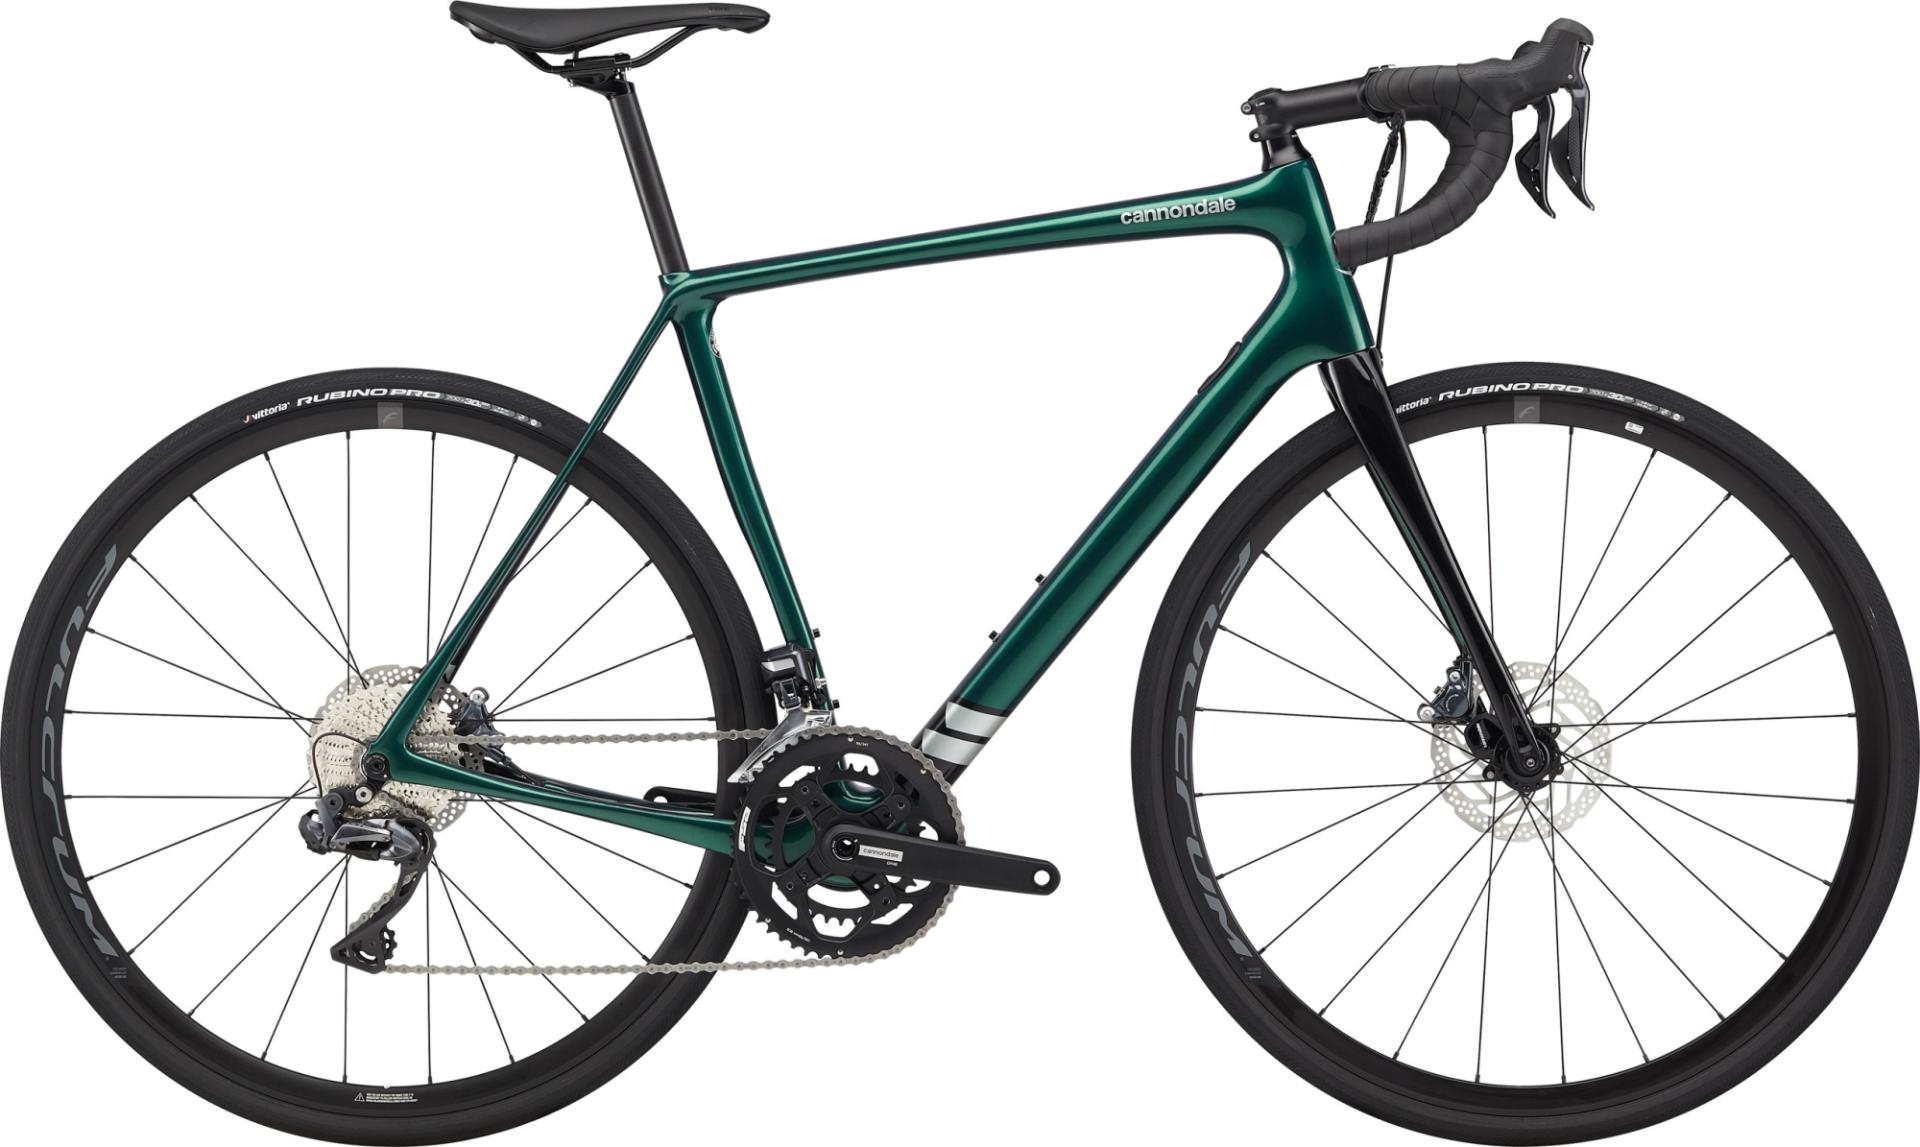 Cannondale Synapse Carbon Ultegra Di2 országúti kerékpár - zöld - 56 cm (2020)